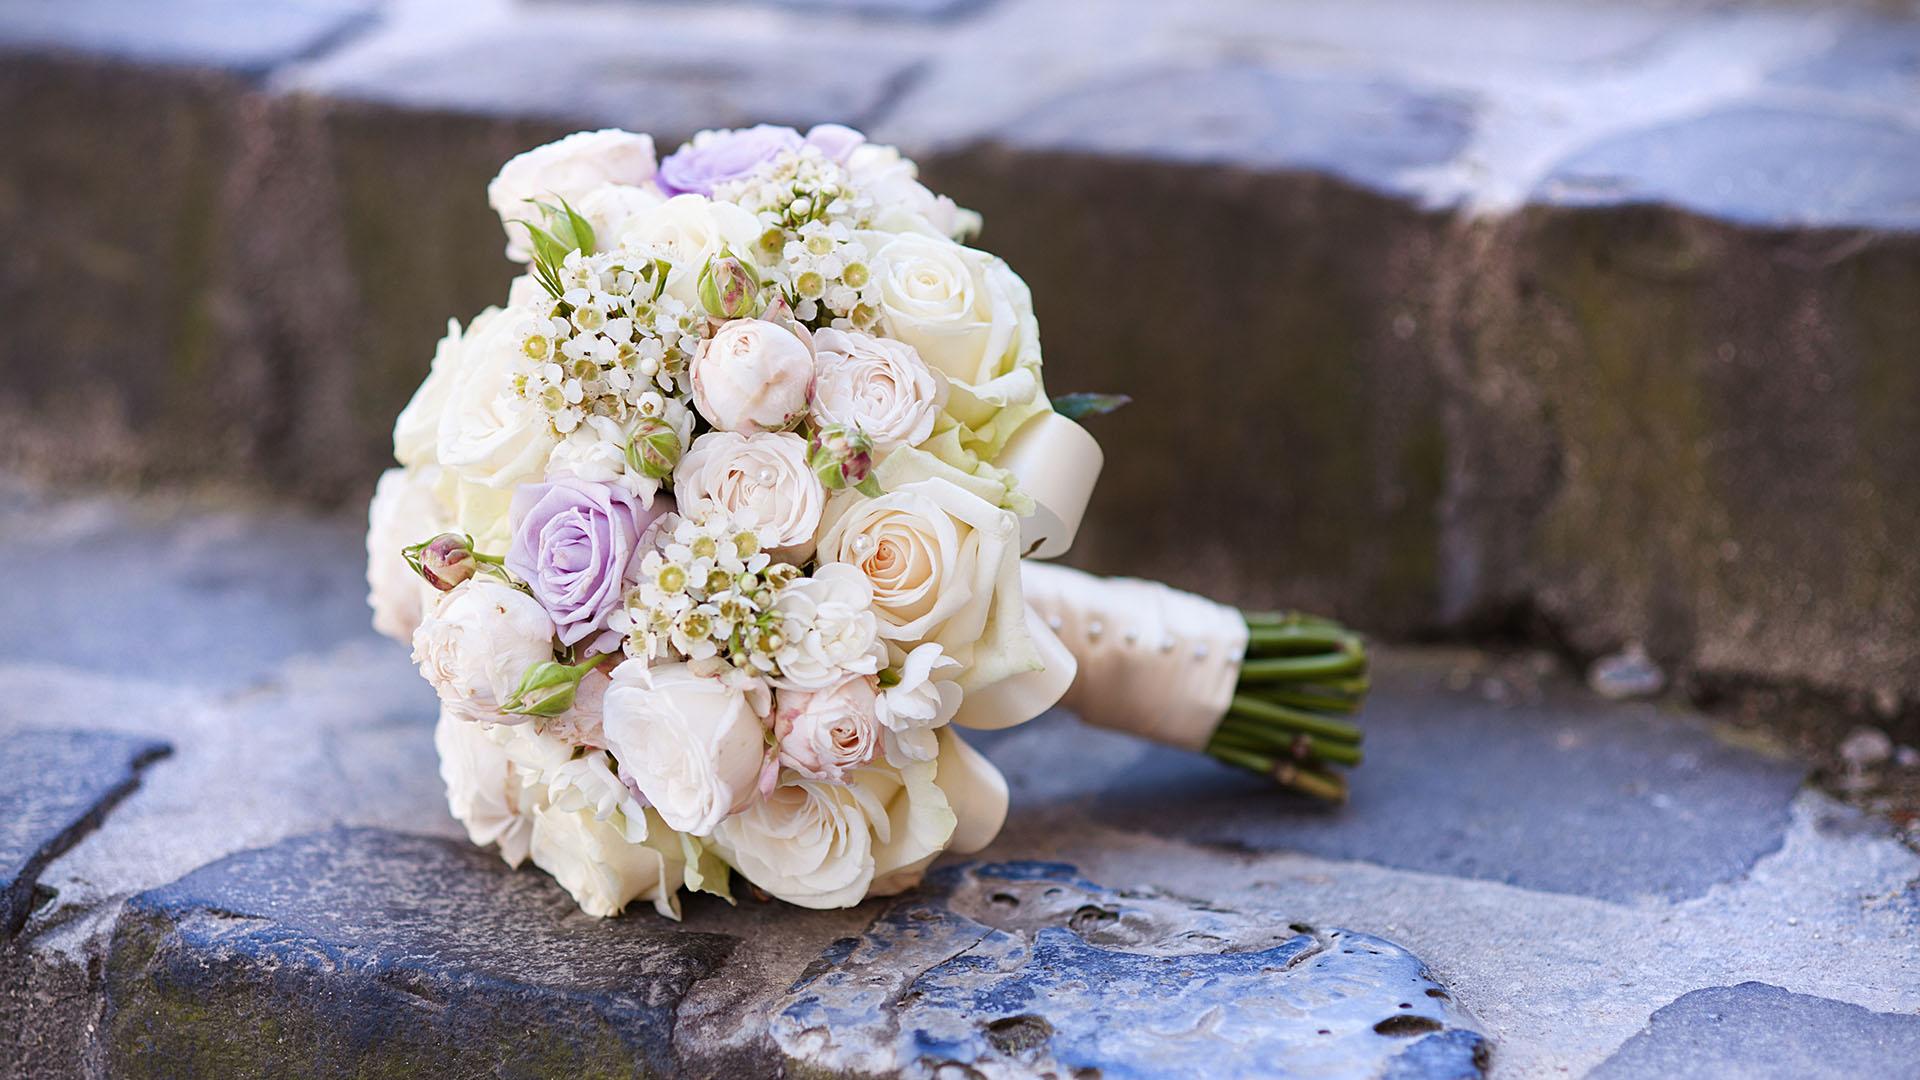 Wedding Flowers - EMY Custom Flowers - Westchester NY